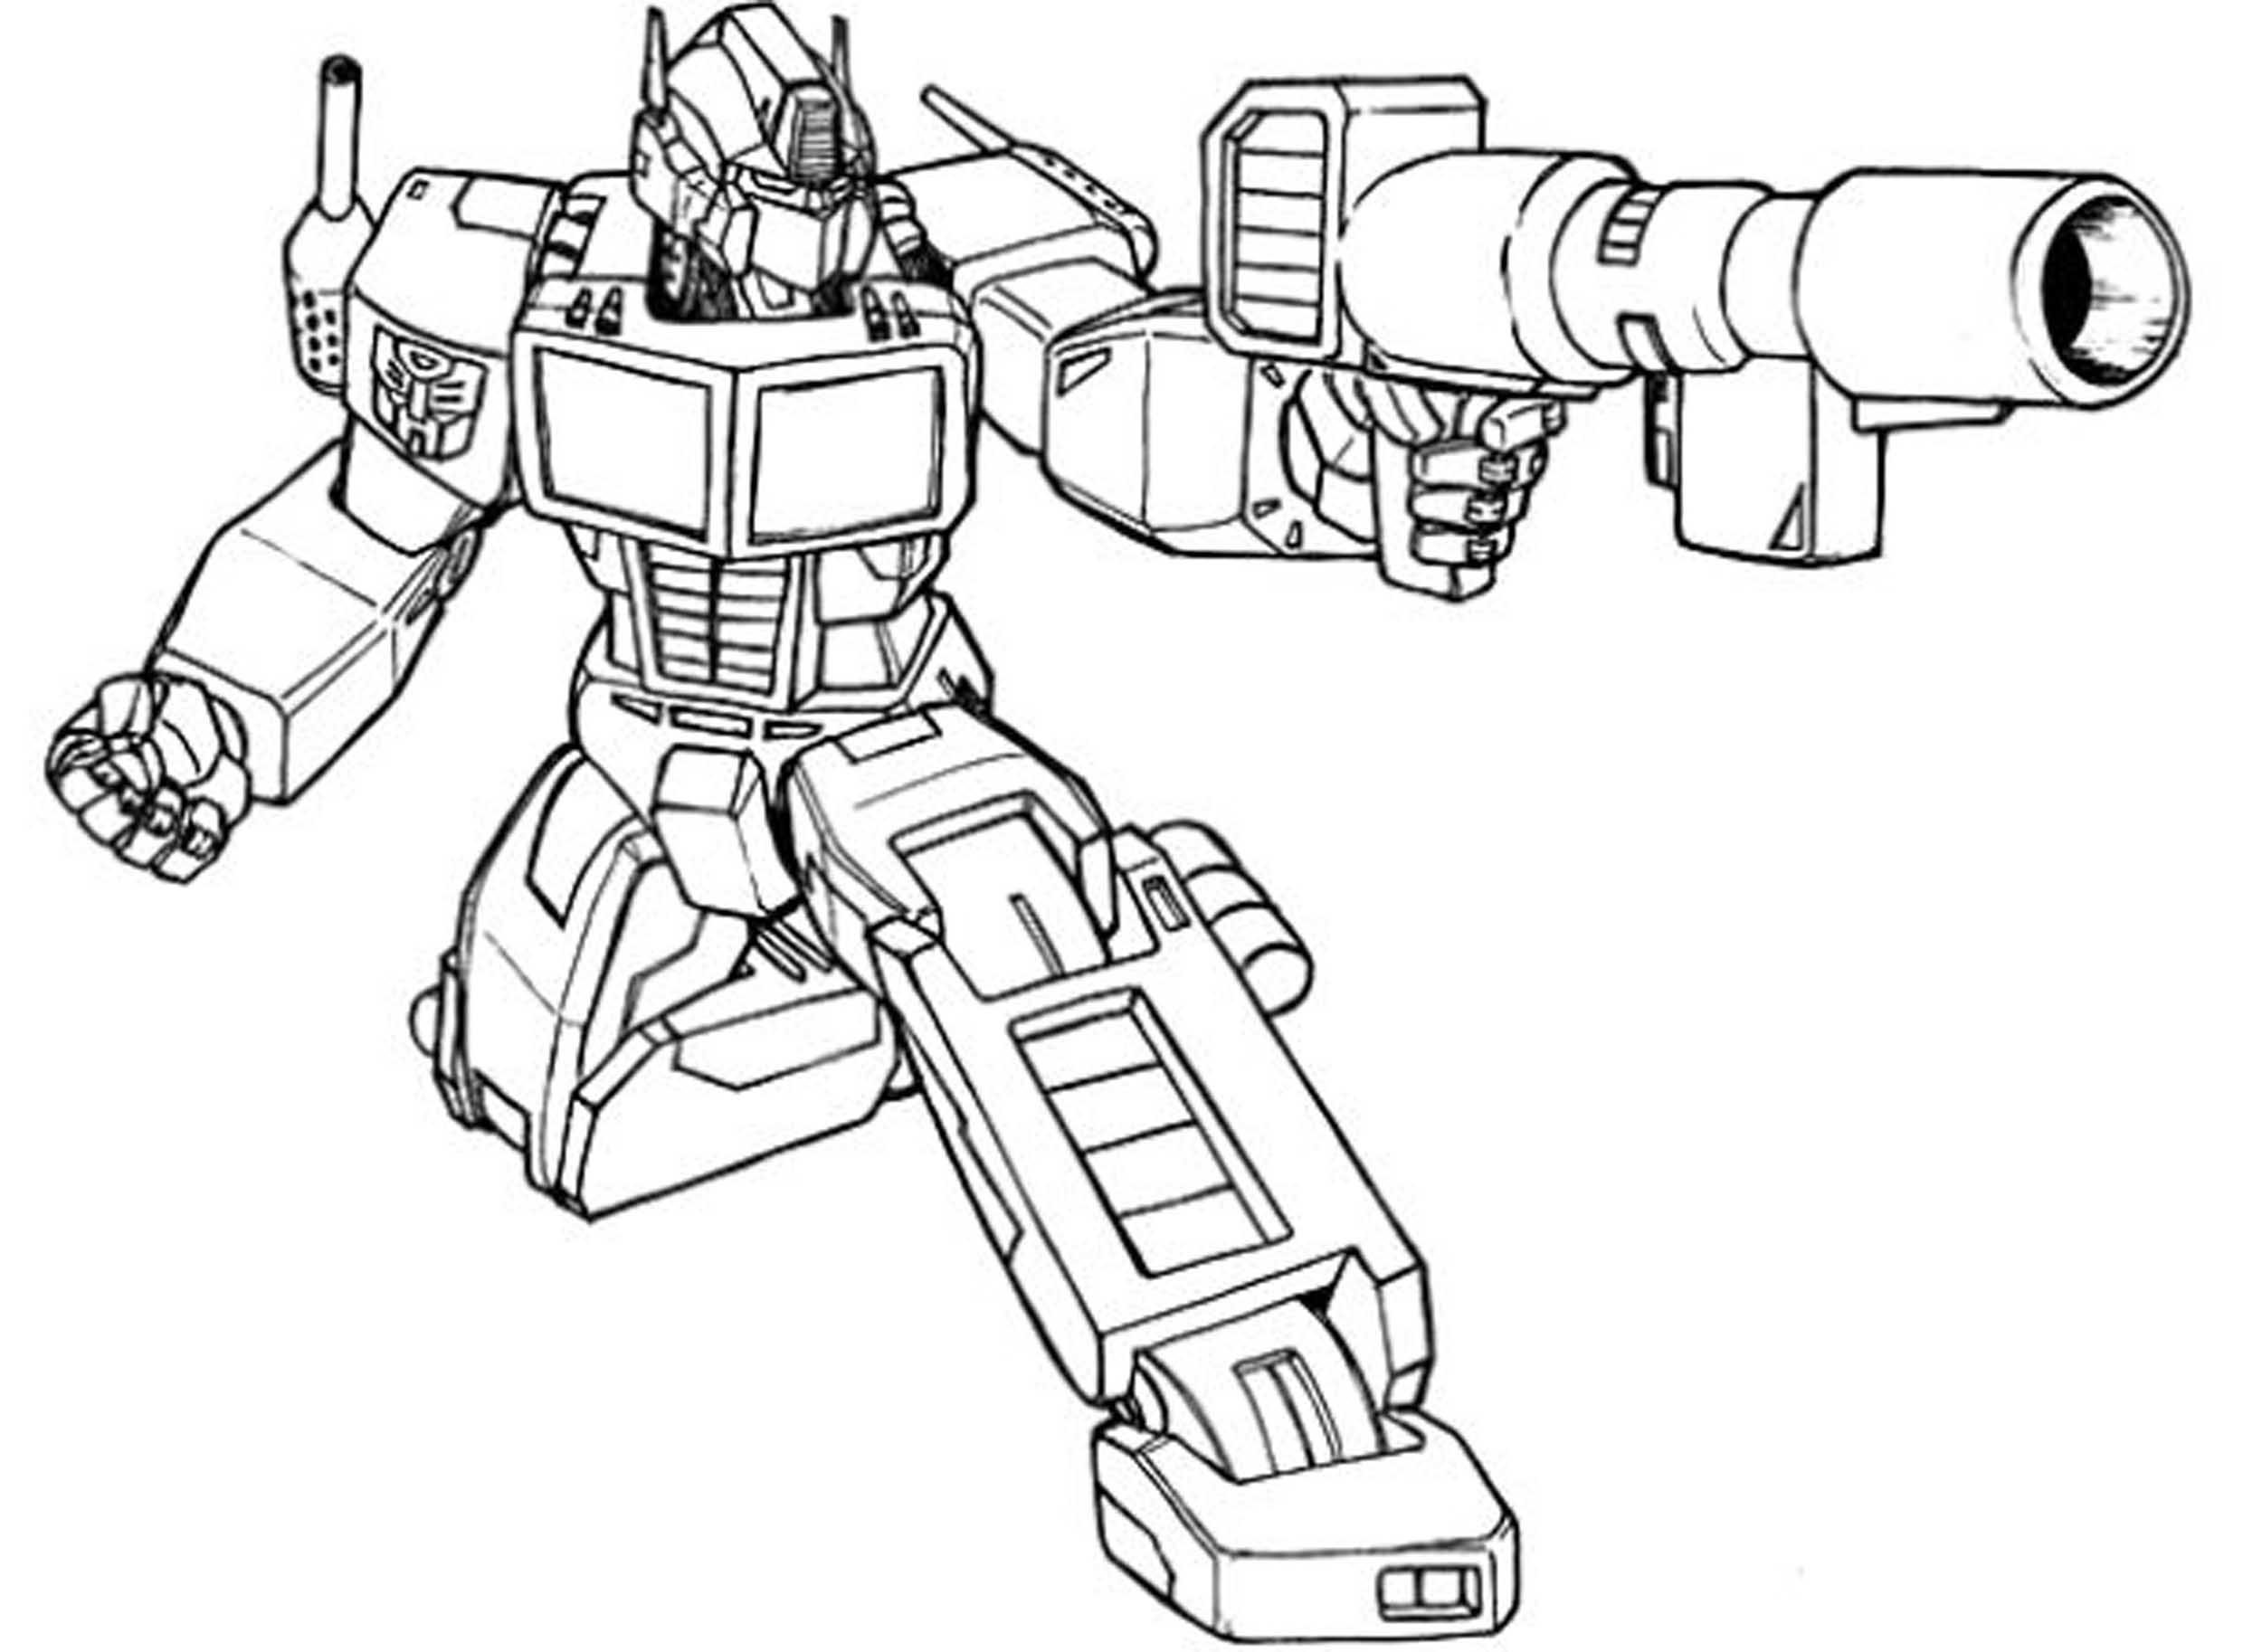 Optimus Prime Fighting Coloring Page - Free Printable ...